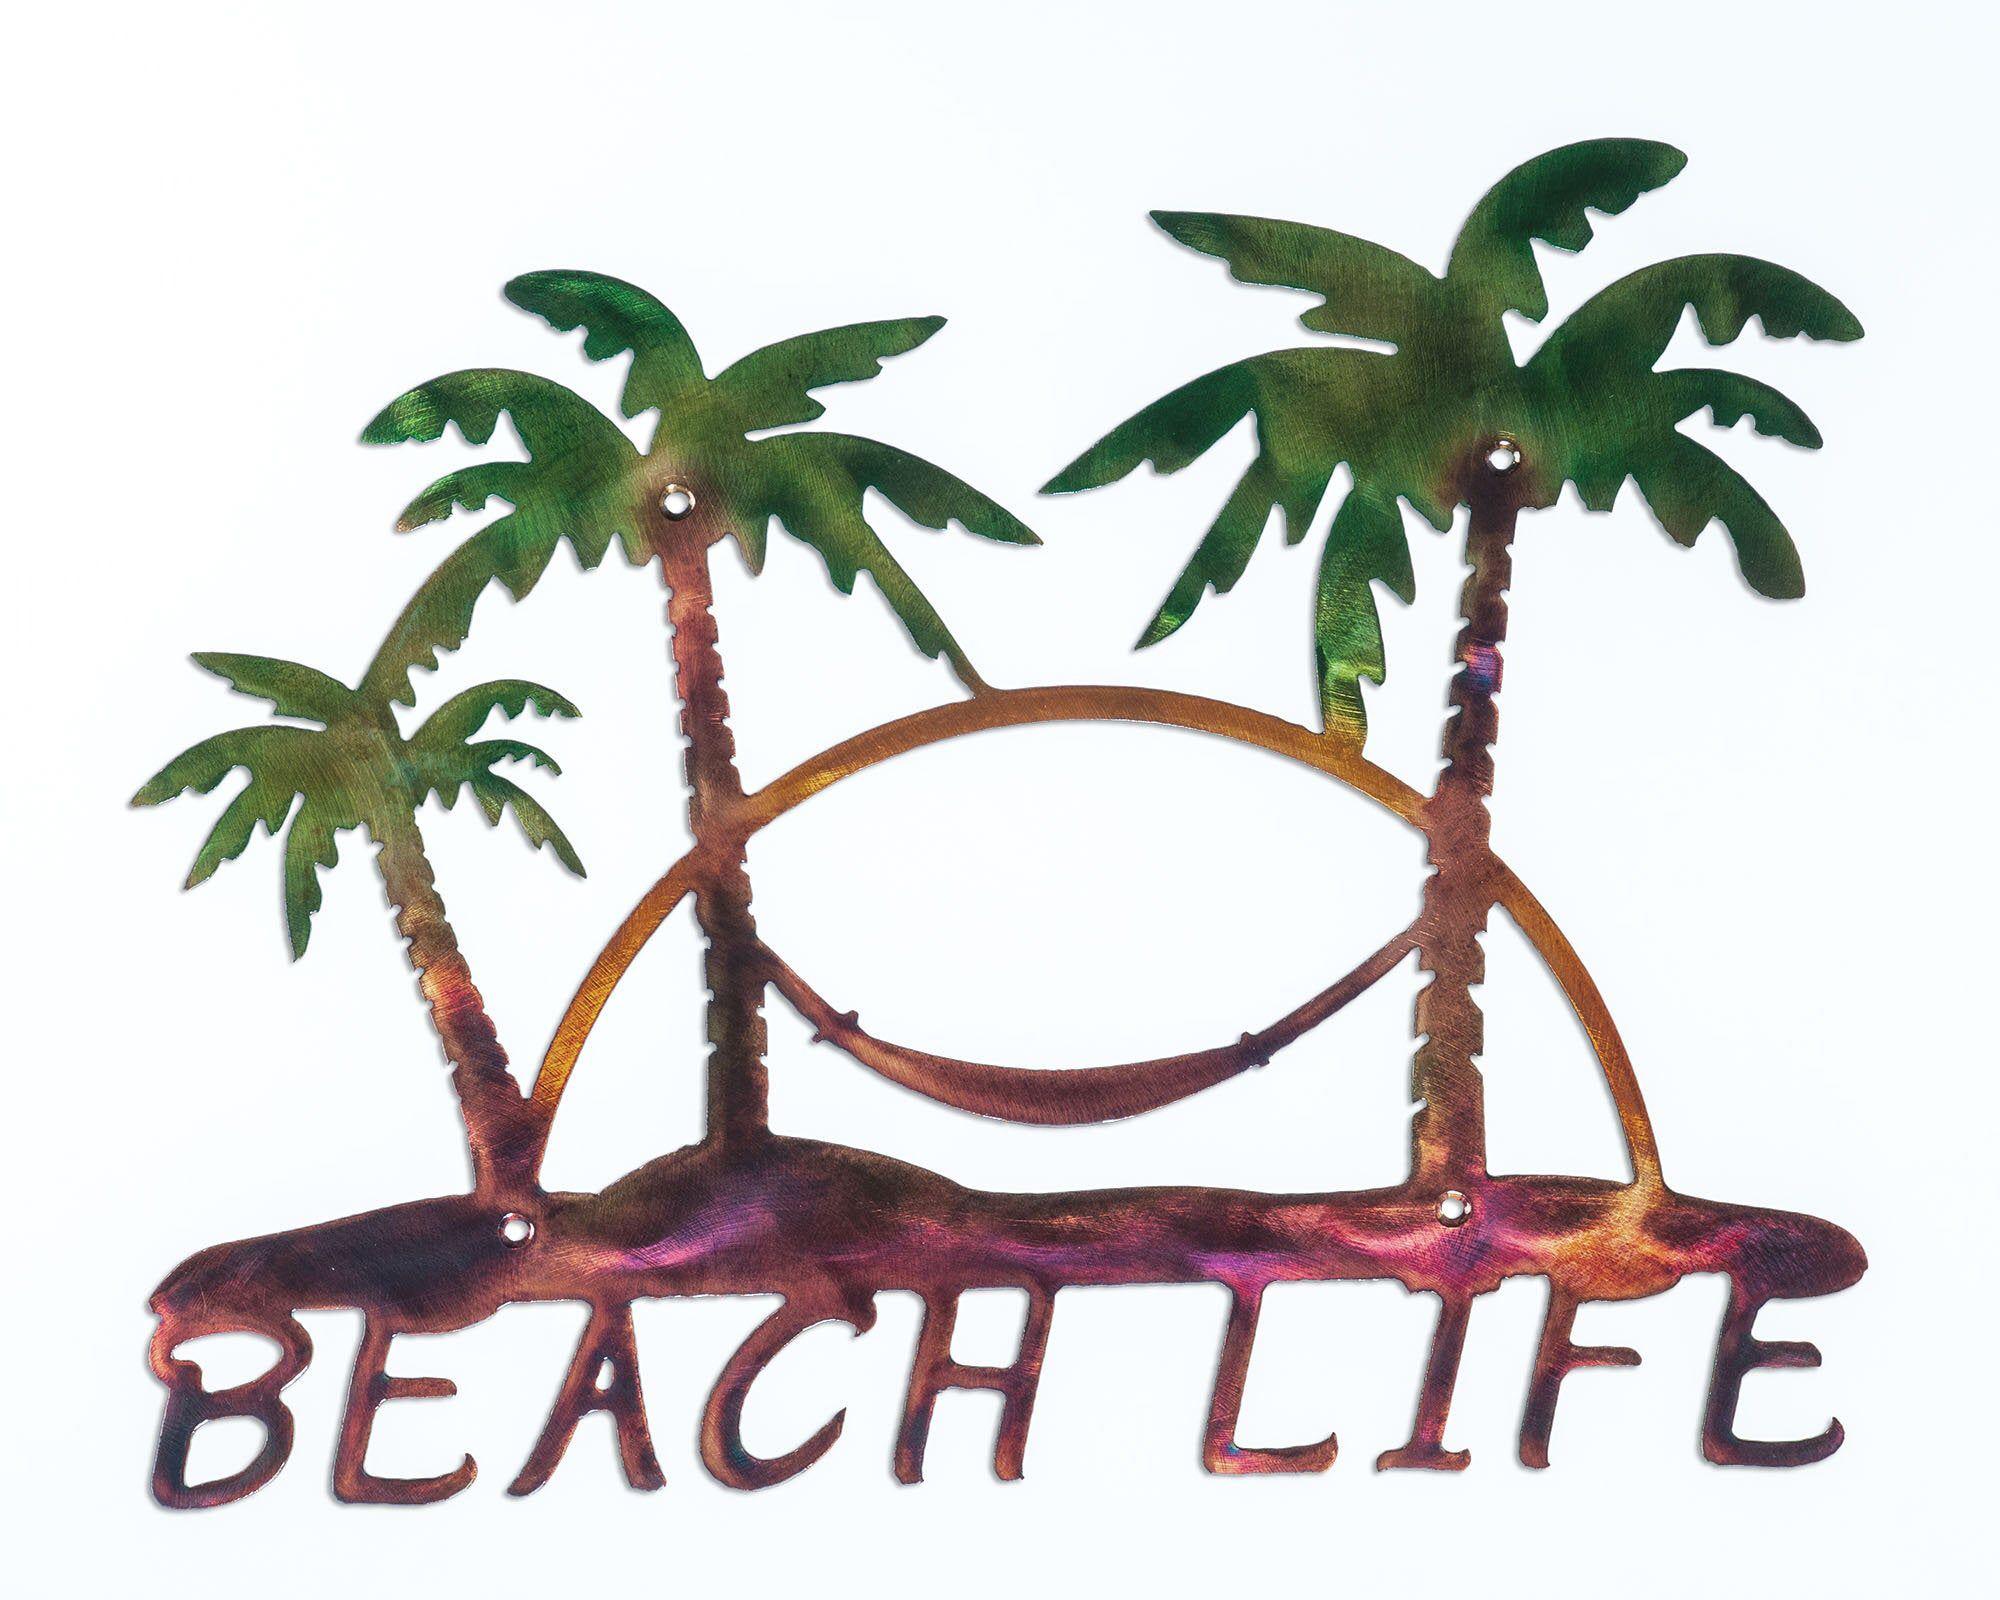 Beach Life Palm Trees Hammock Nautical Metal Indoor Or Outdoor Wall Art In 2020 Palm Tree Wall Art Outdoor Wall Art Palm Trees